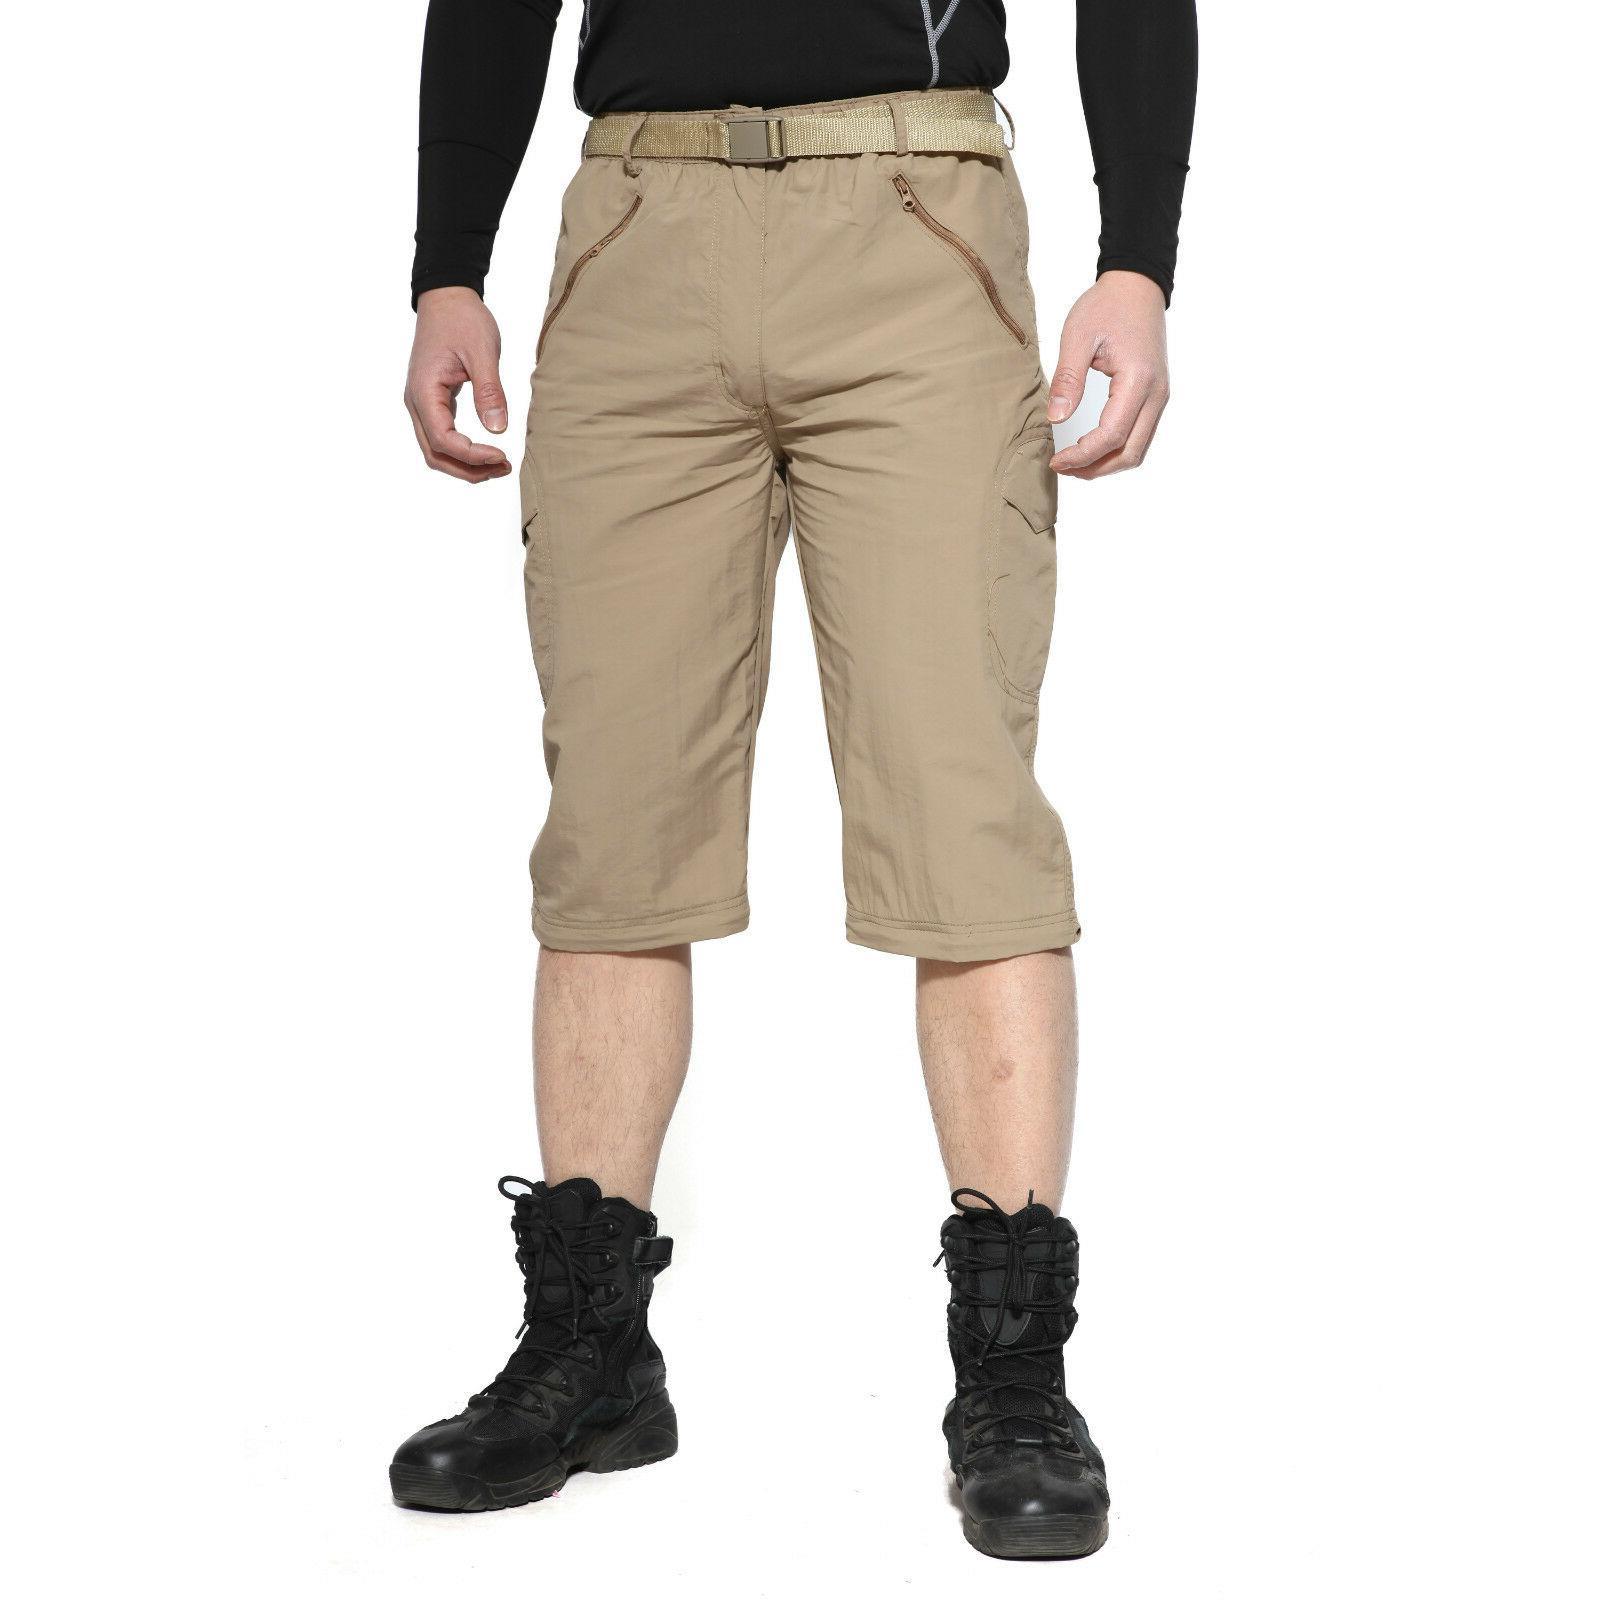 TACVASEN Drying Trousers Hunting Pants